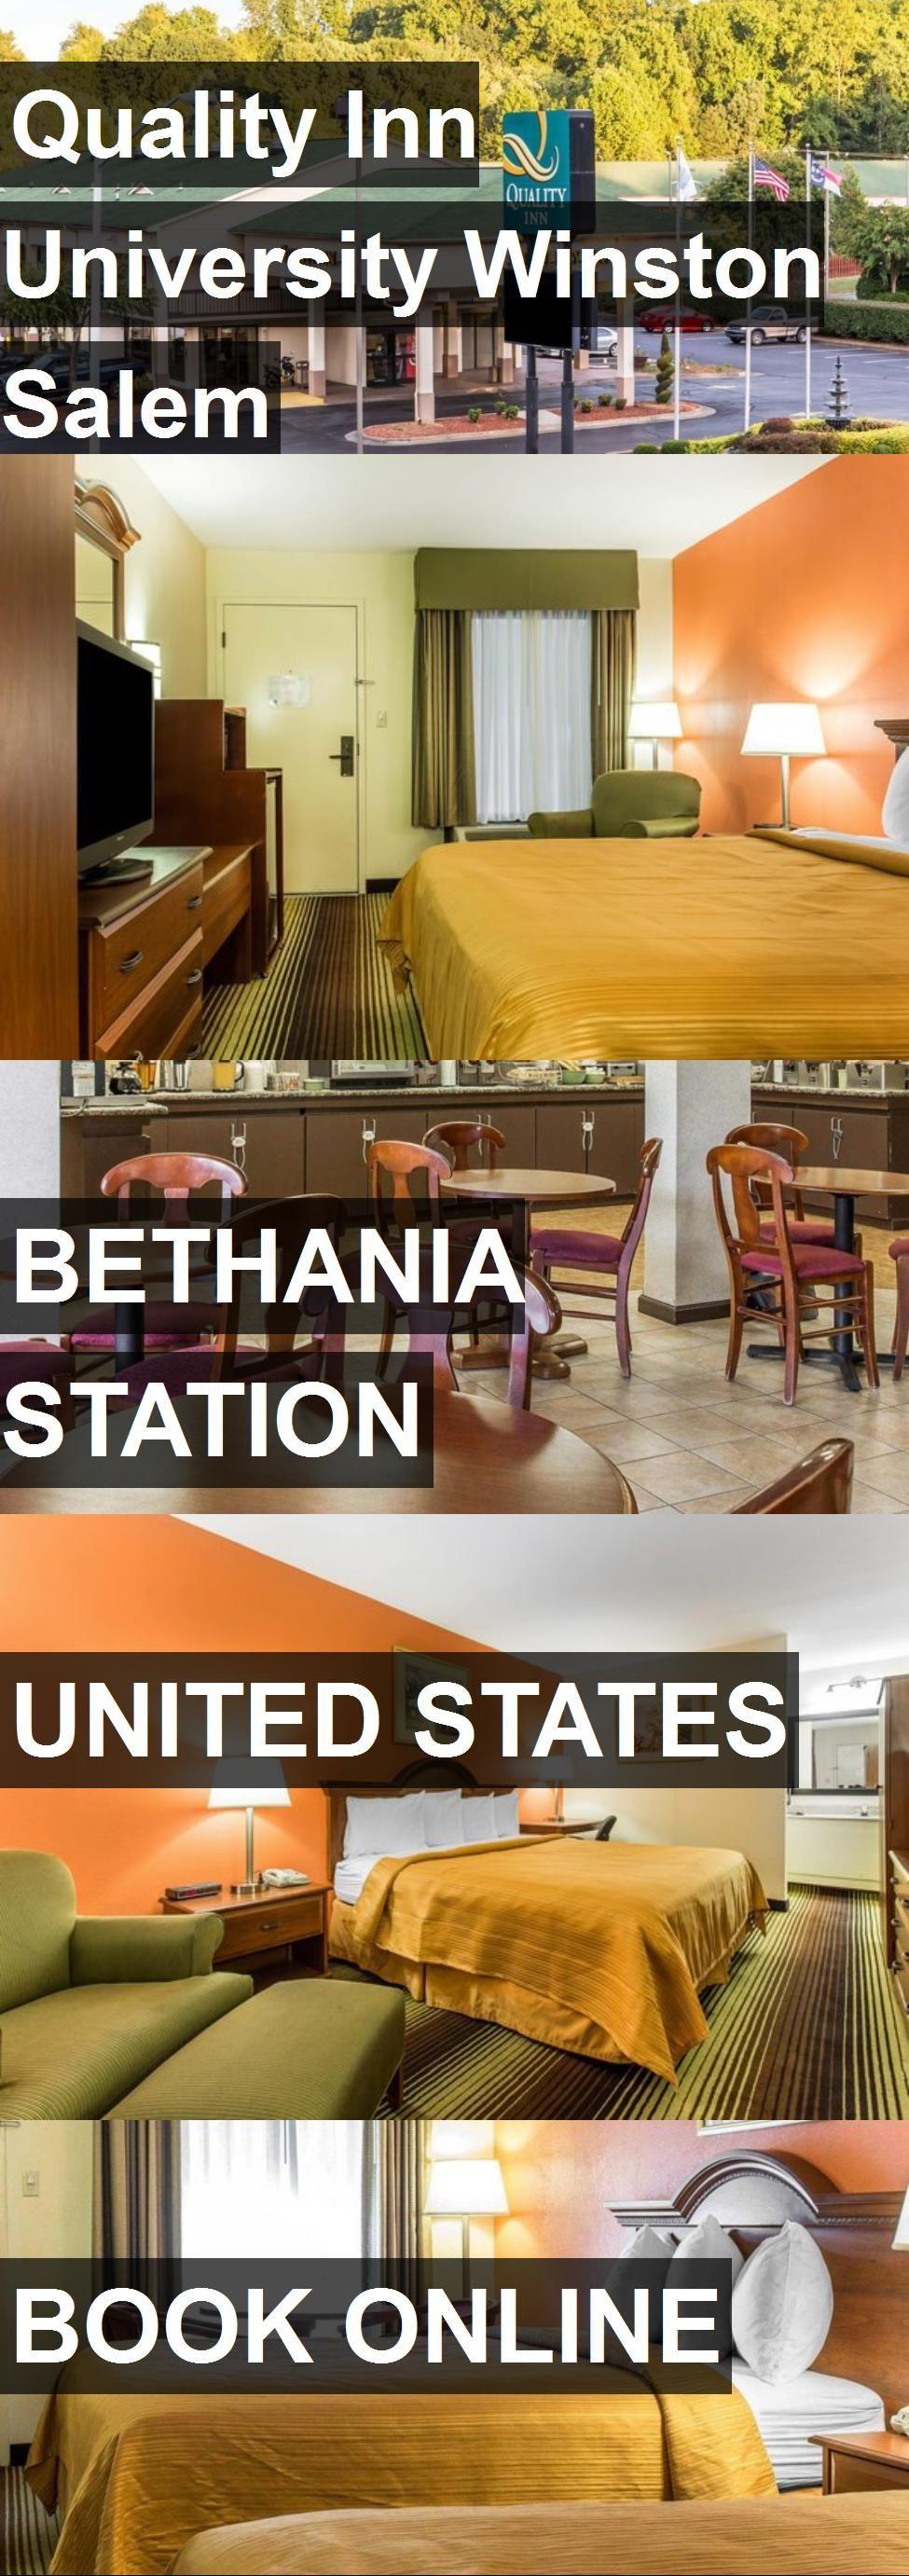 Hotel quality inn university winston salem in bethania